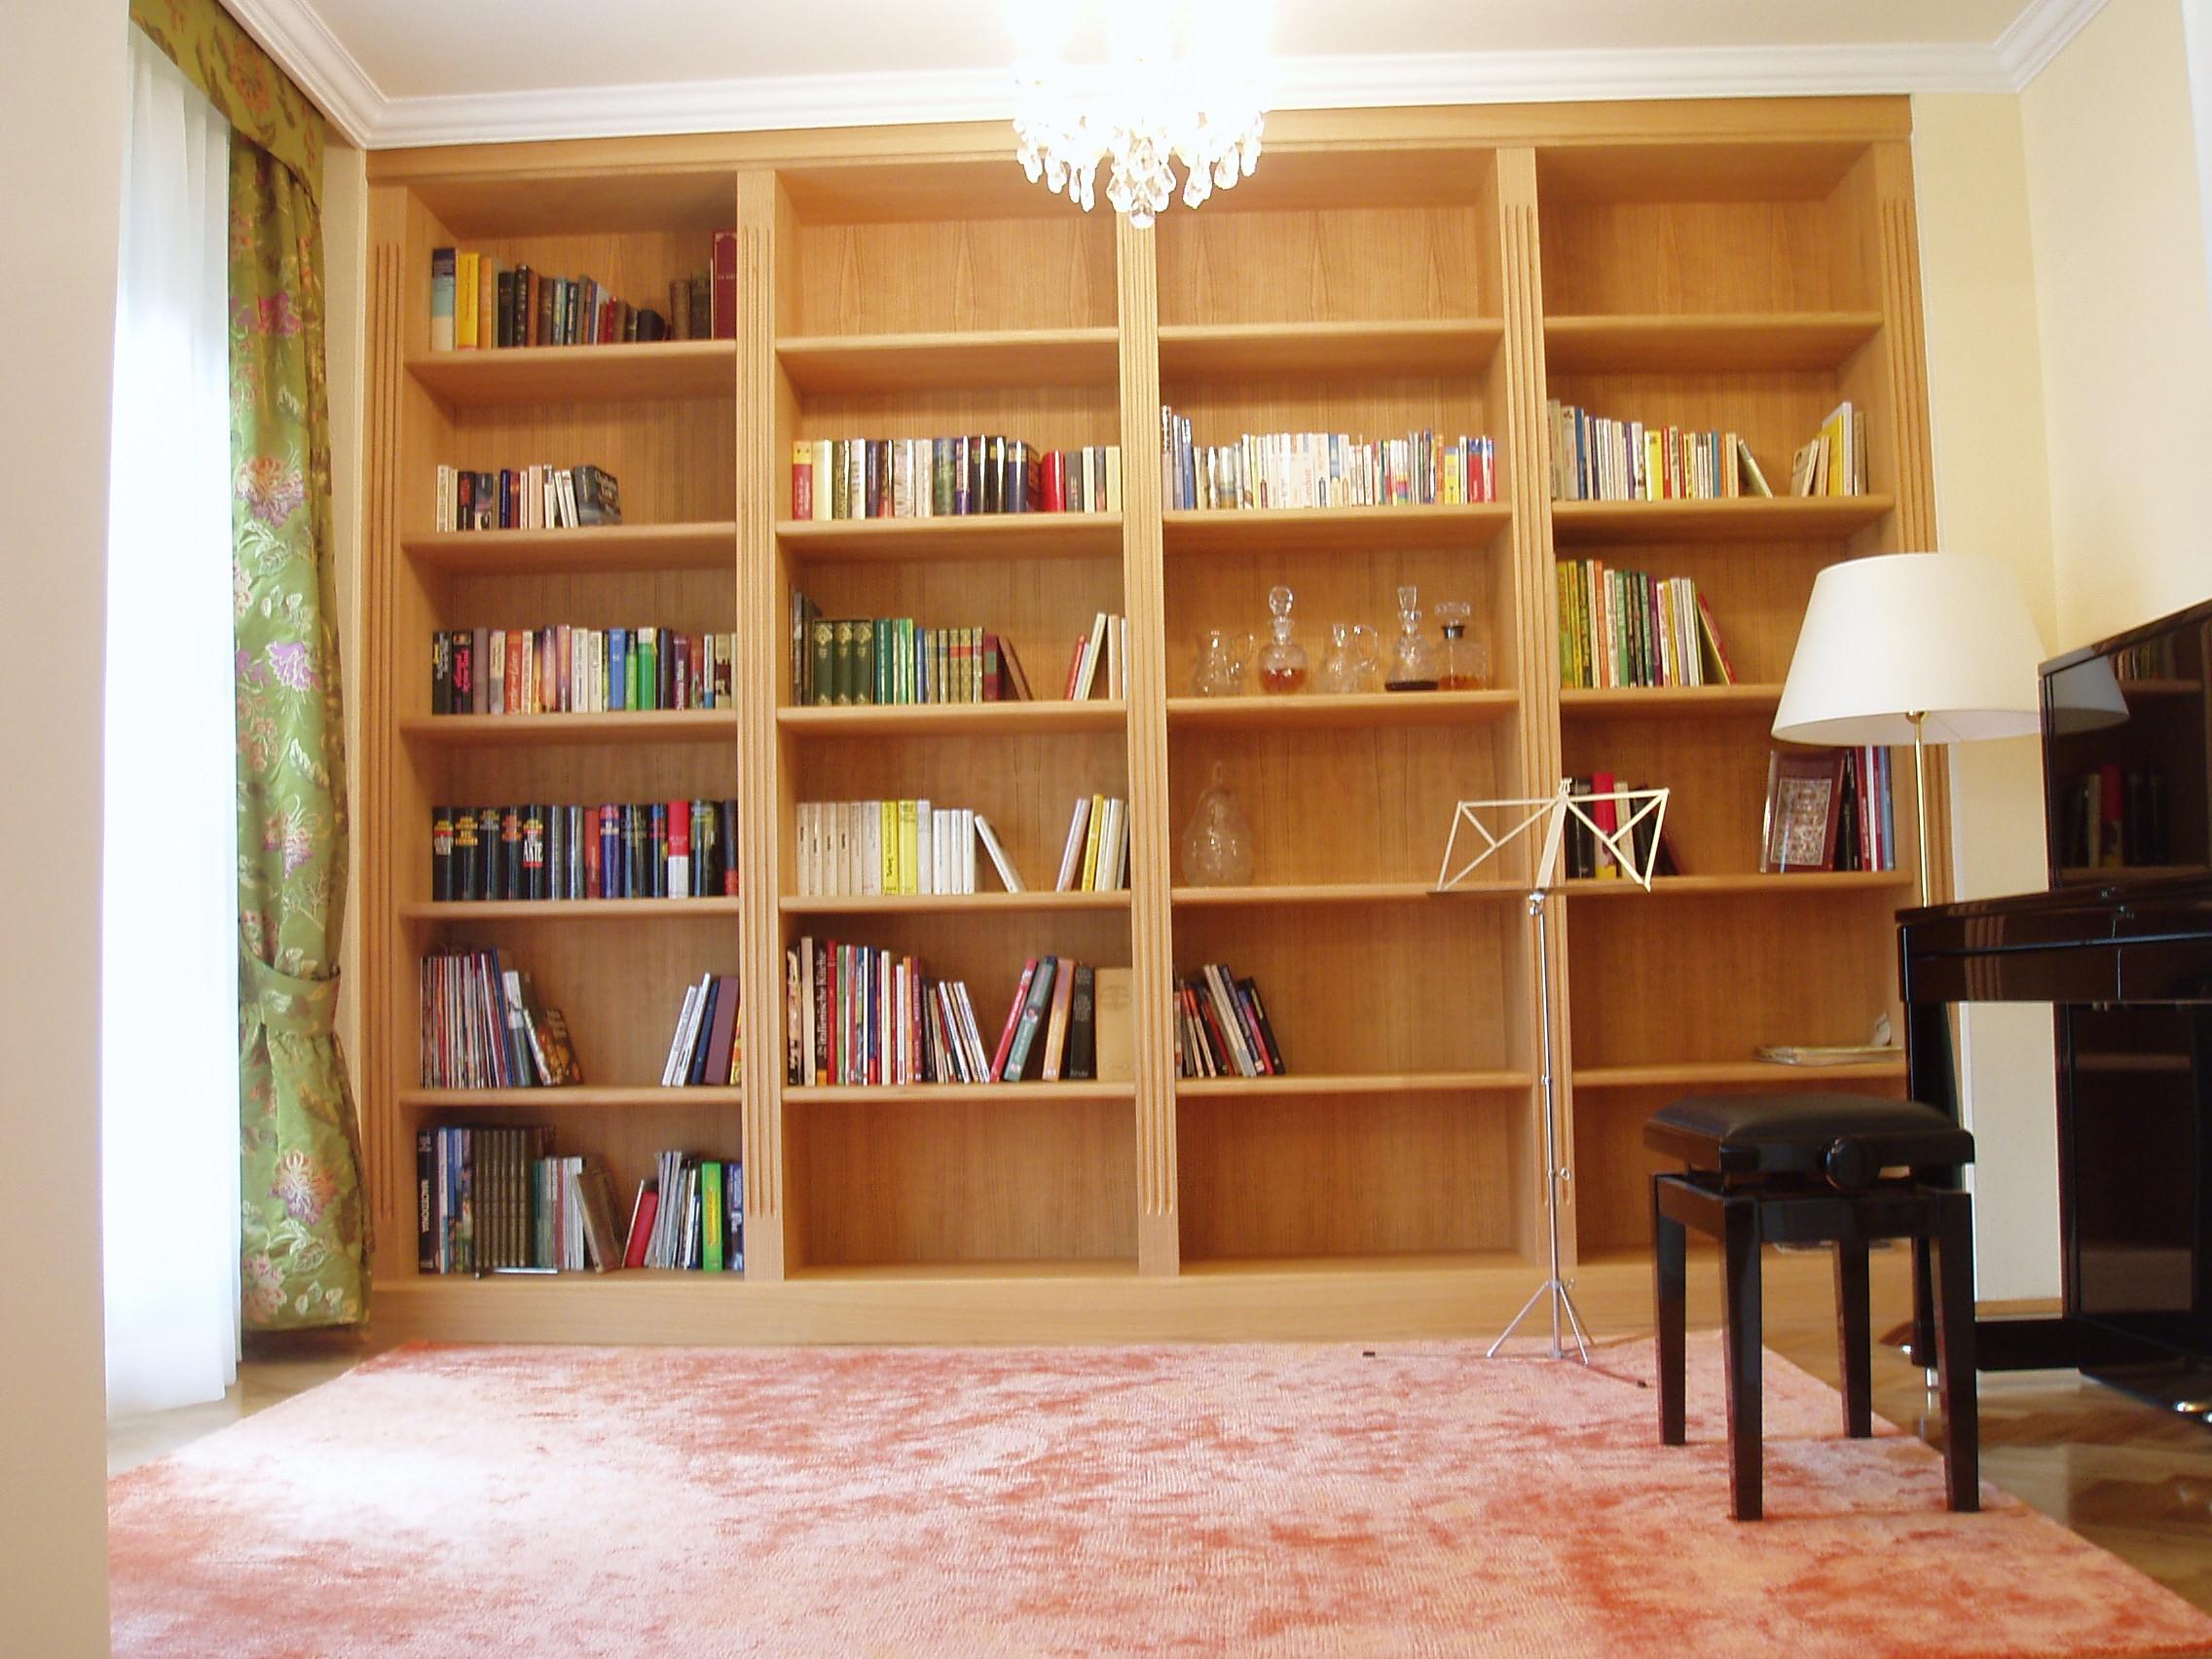 Tischlerei Bibliothek sestak P1010008.JPG